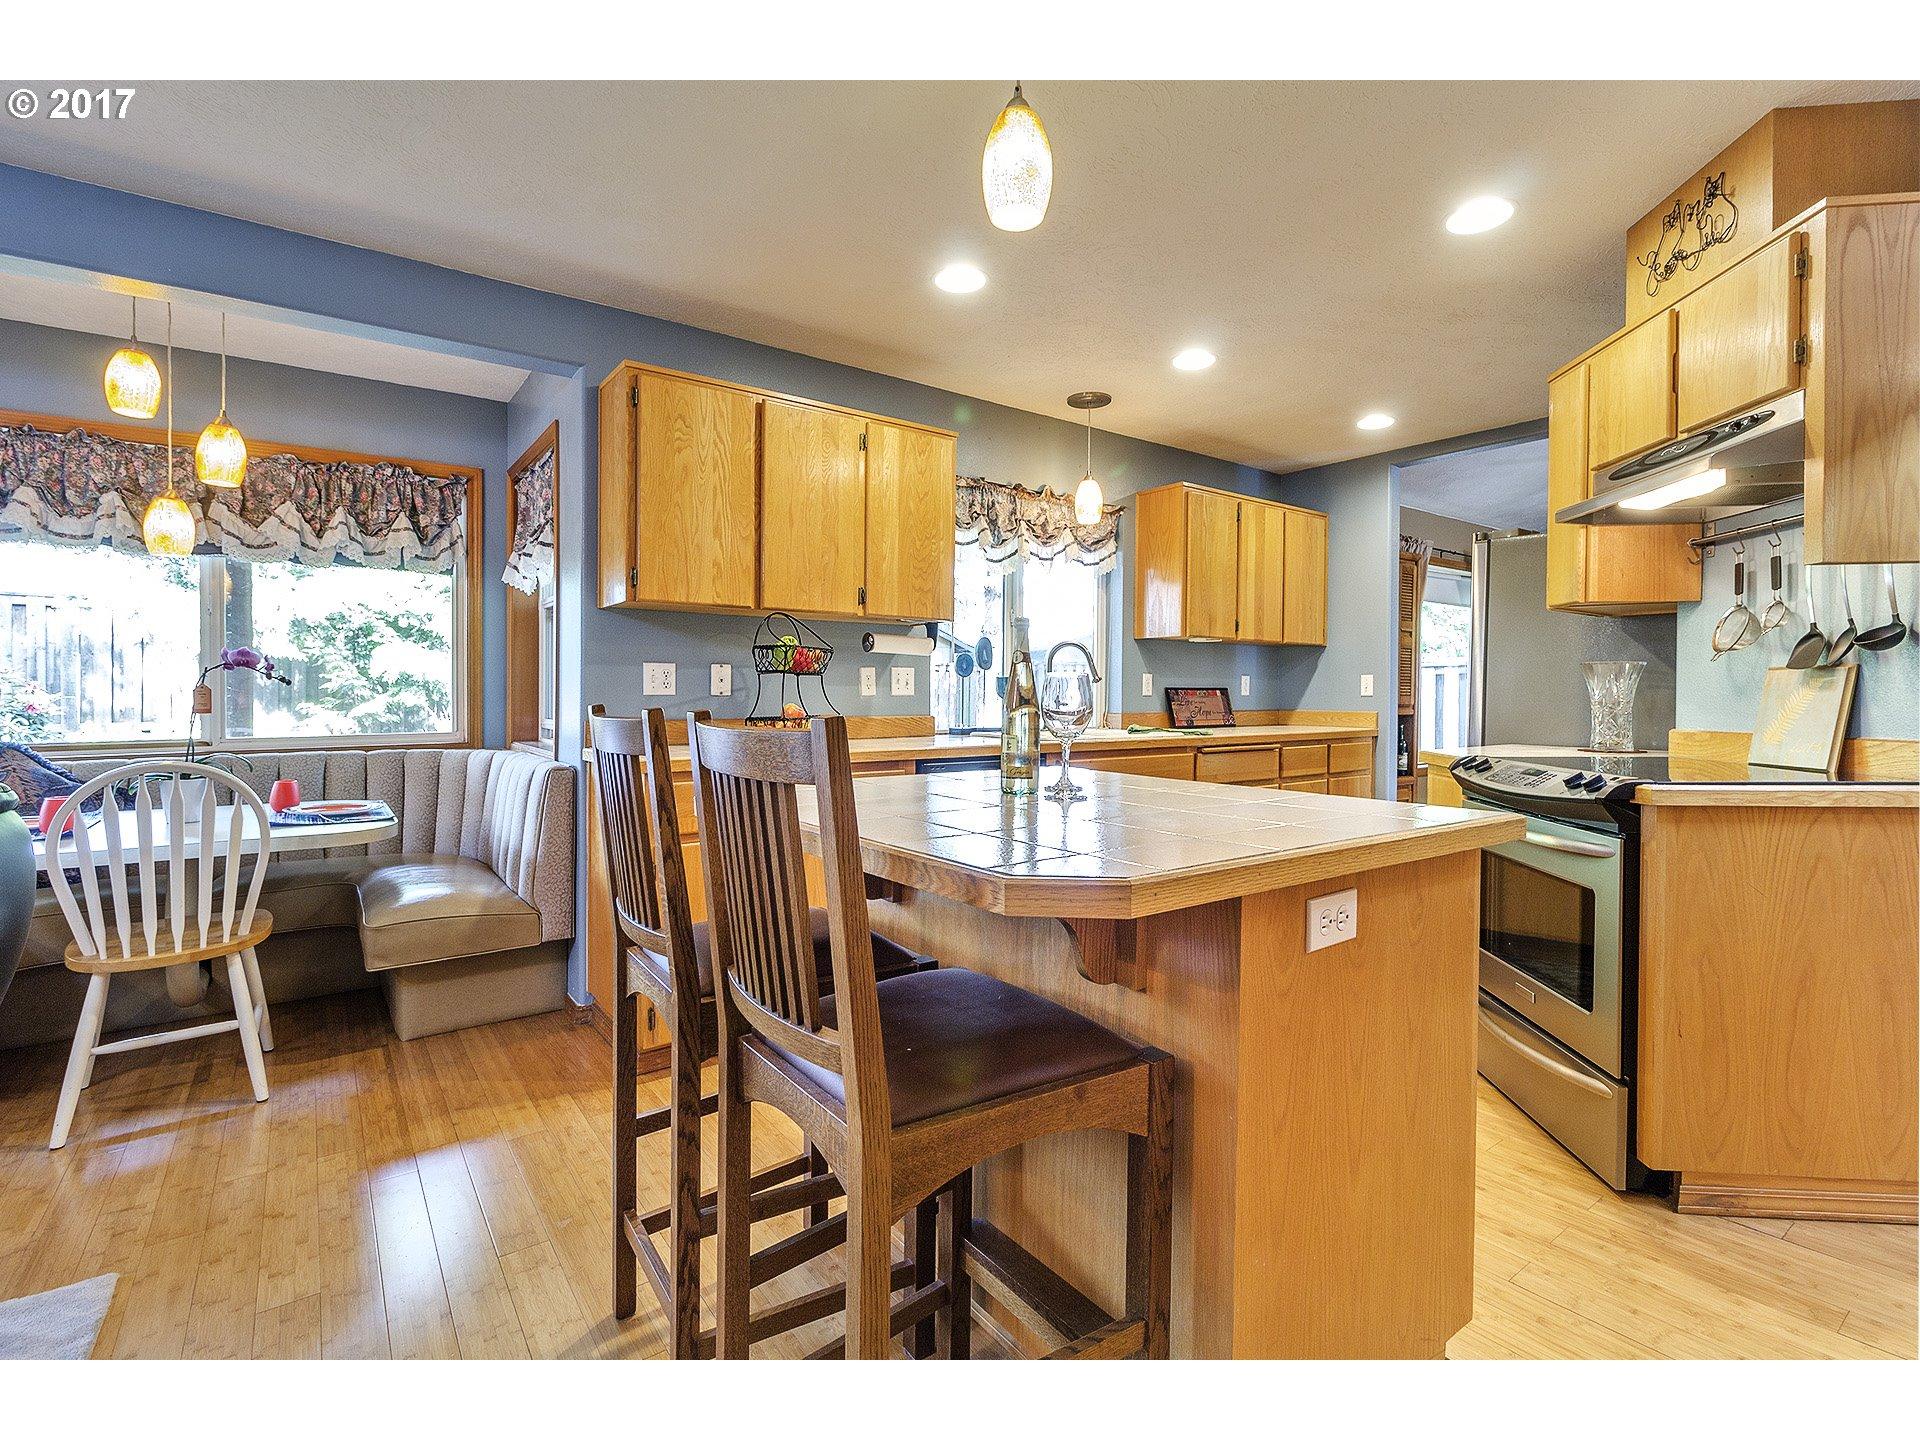 3411 NE 150TH AVE Portland, OR 97230 - MLS #: 17609951